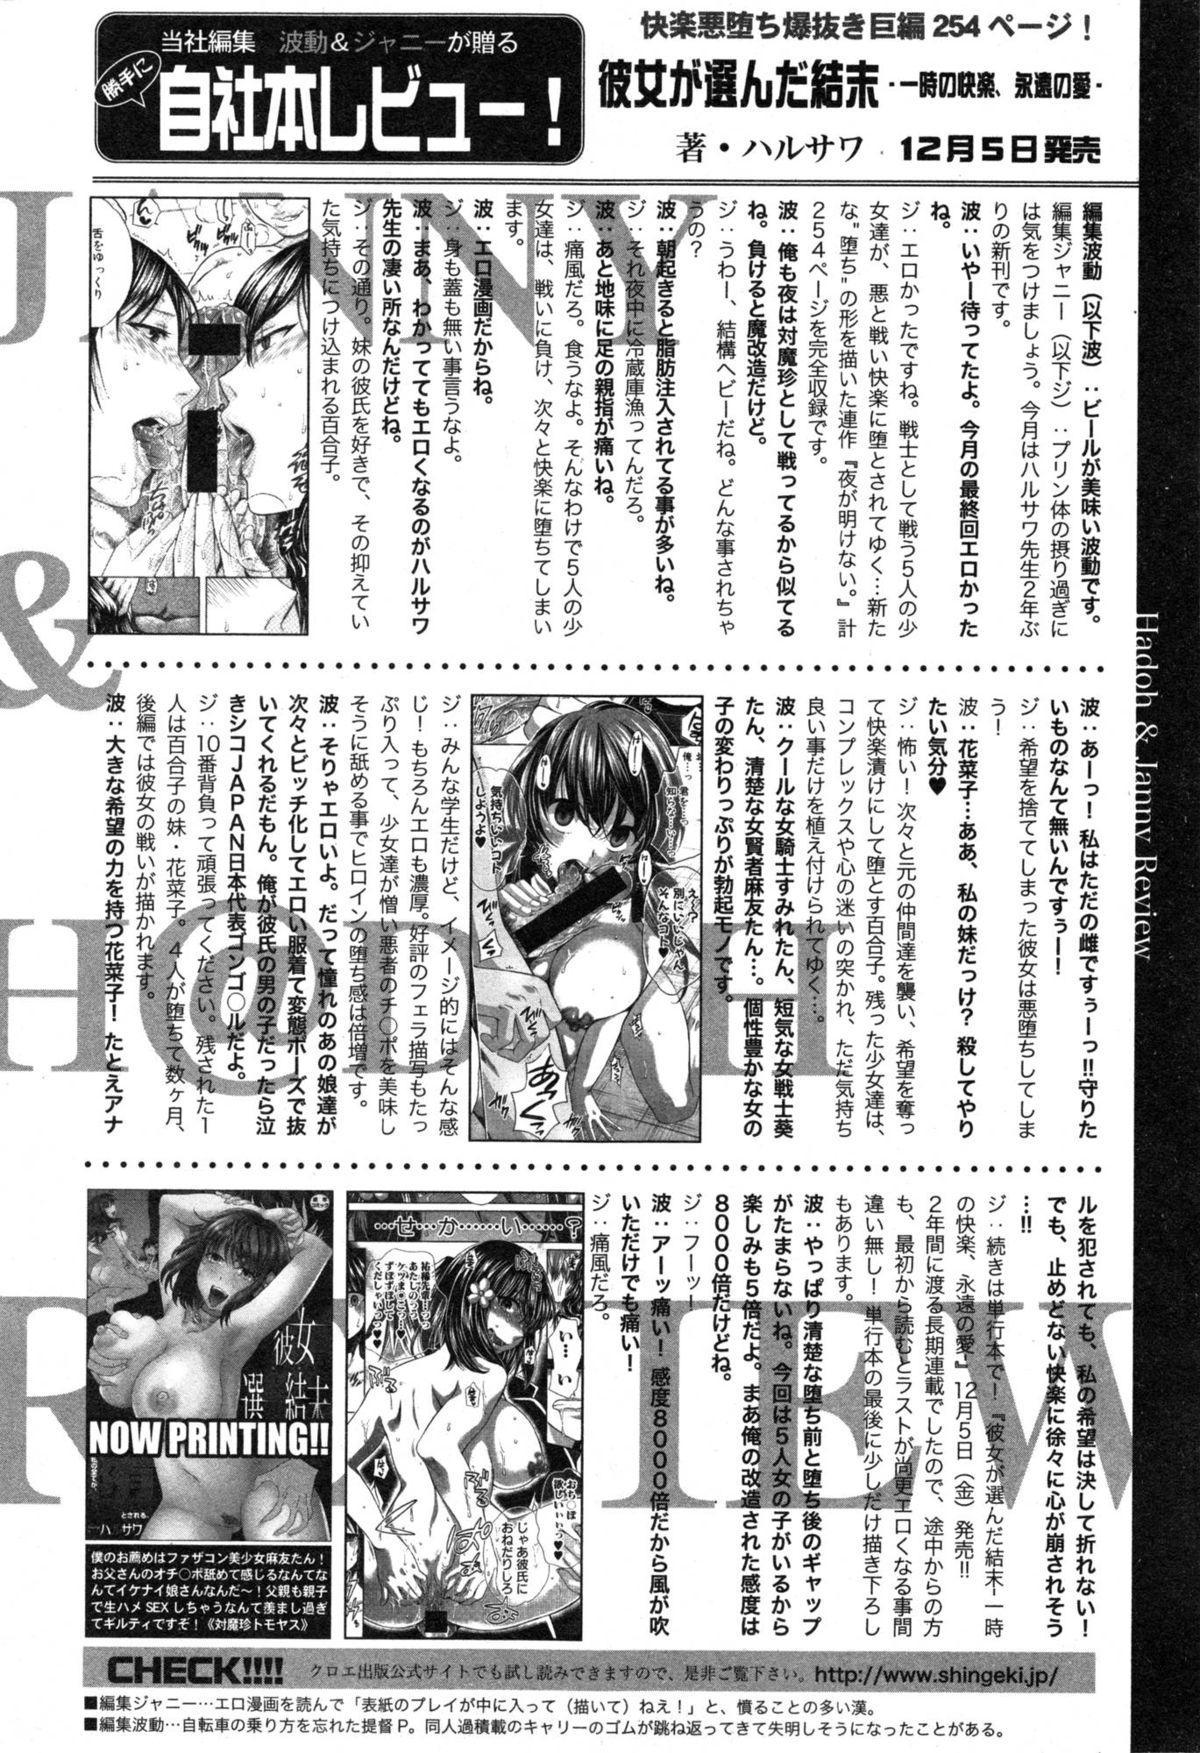 COMIC Shingeki 2015-01 337